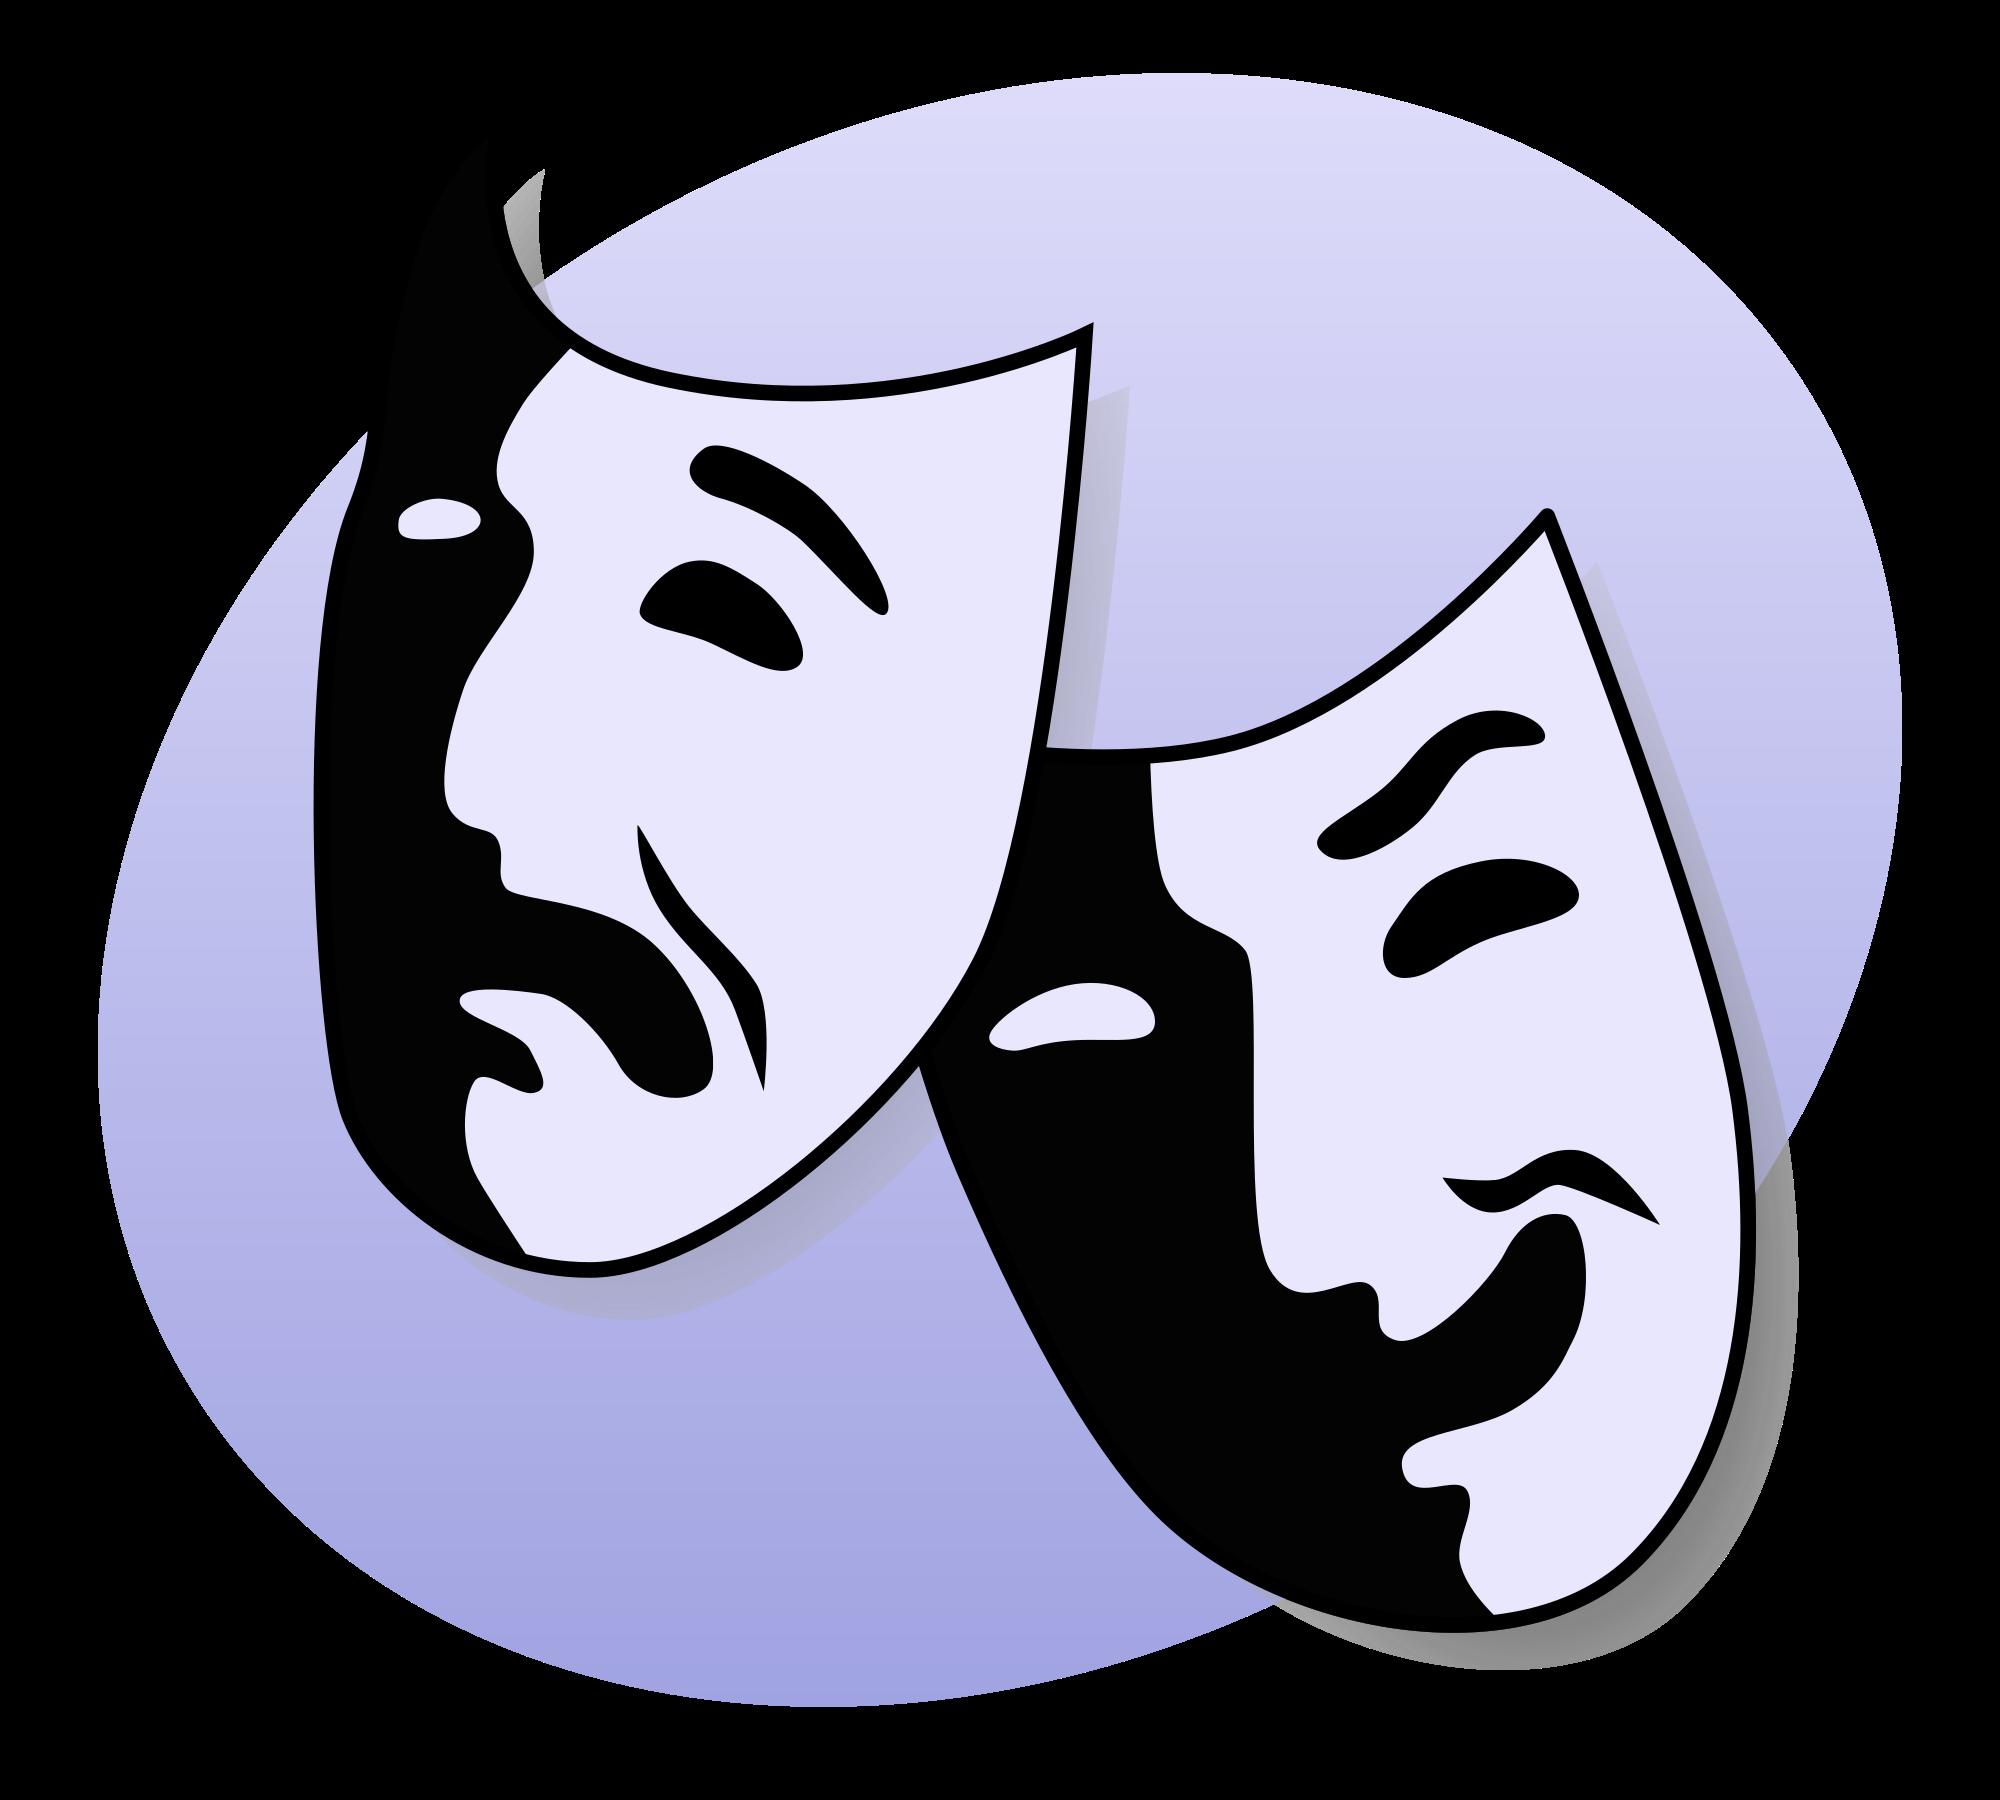 Burncourt national school and. Club clipart speech drama